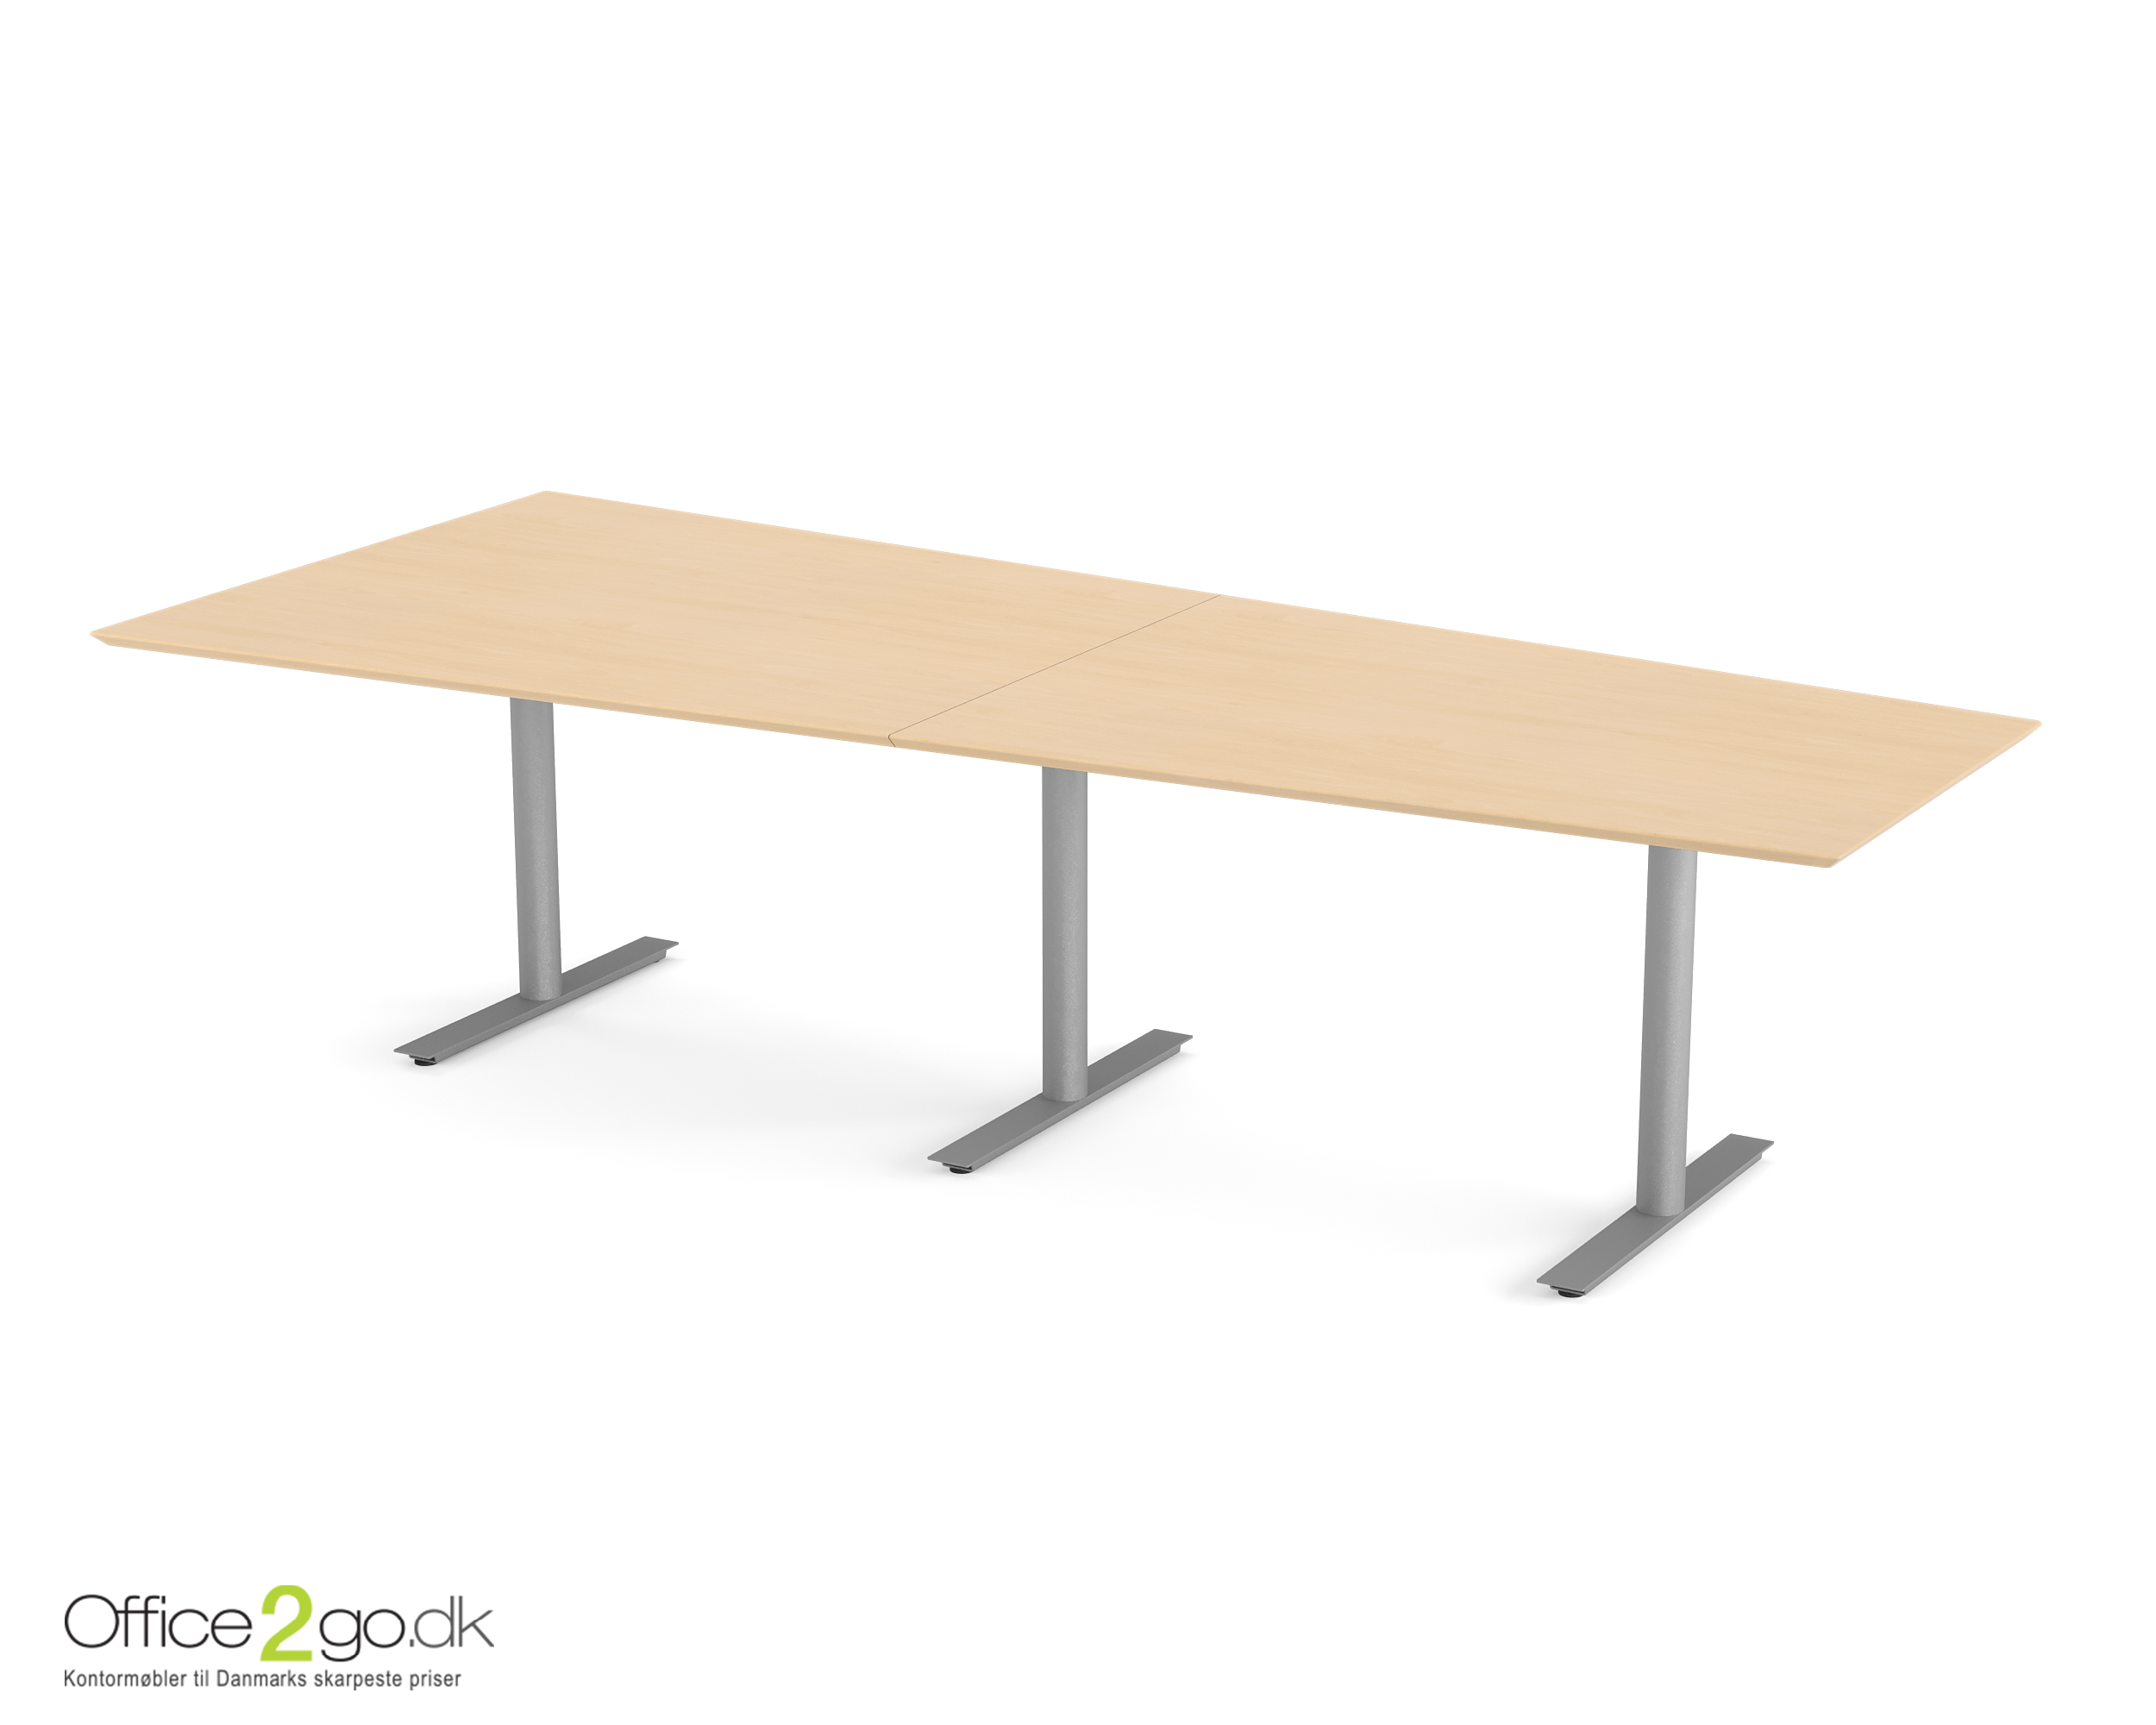 Inline Media mødebord - 8 personer - 280 cm.